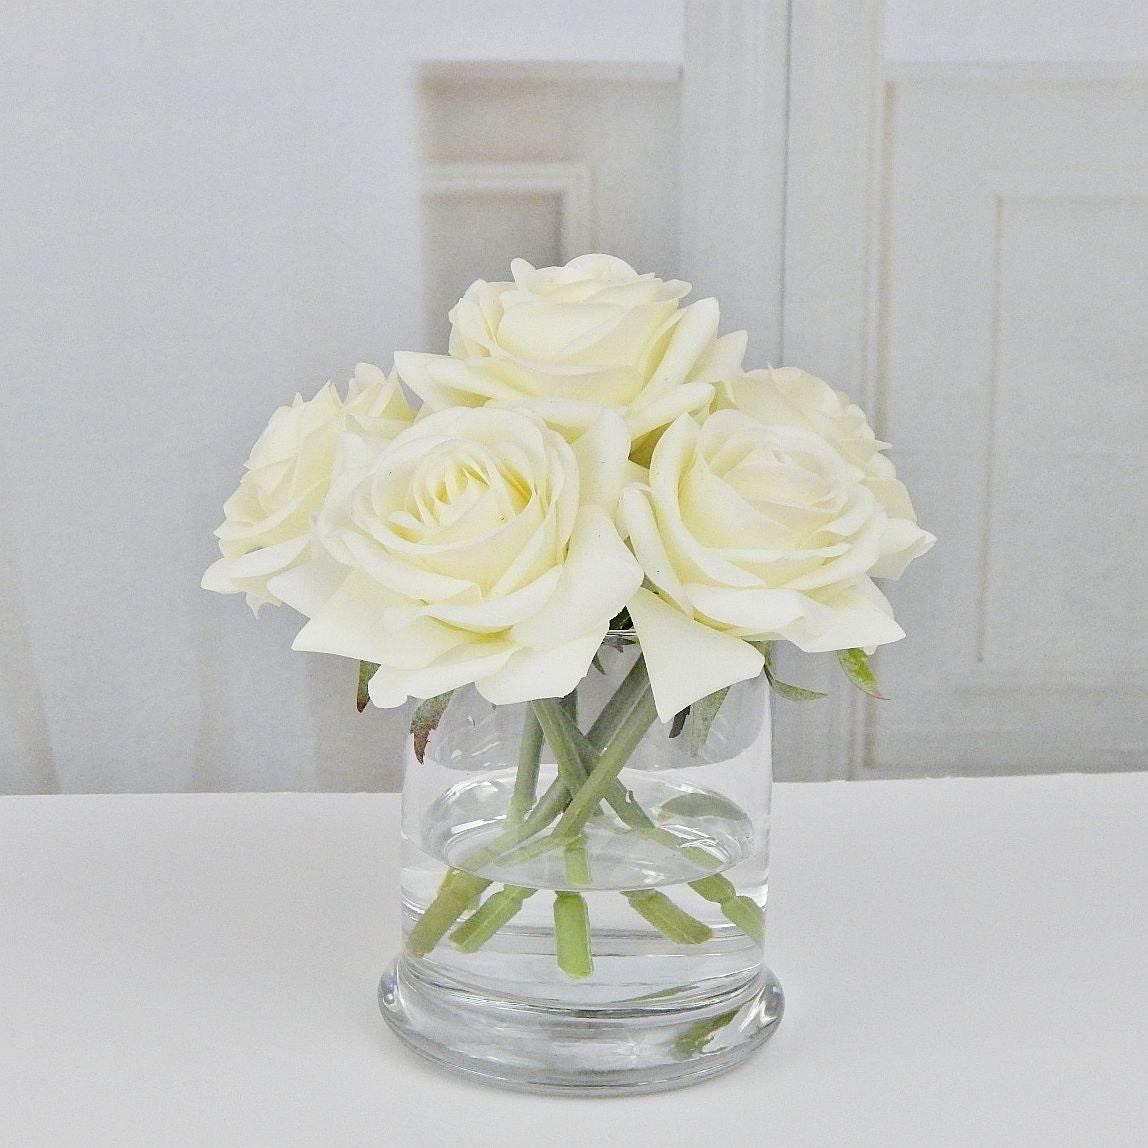 Cream roseroses glass vase faux water acrylic illusion silk cream roseroses glass vase faux water acrylic illusion silk real touch flowers floral arrangement centerpiece home decor gift reviewsmspy